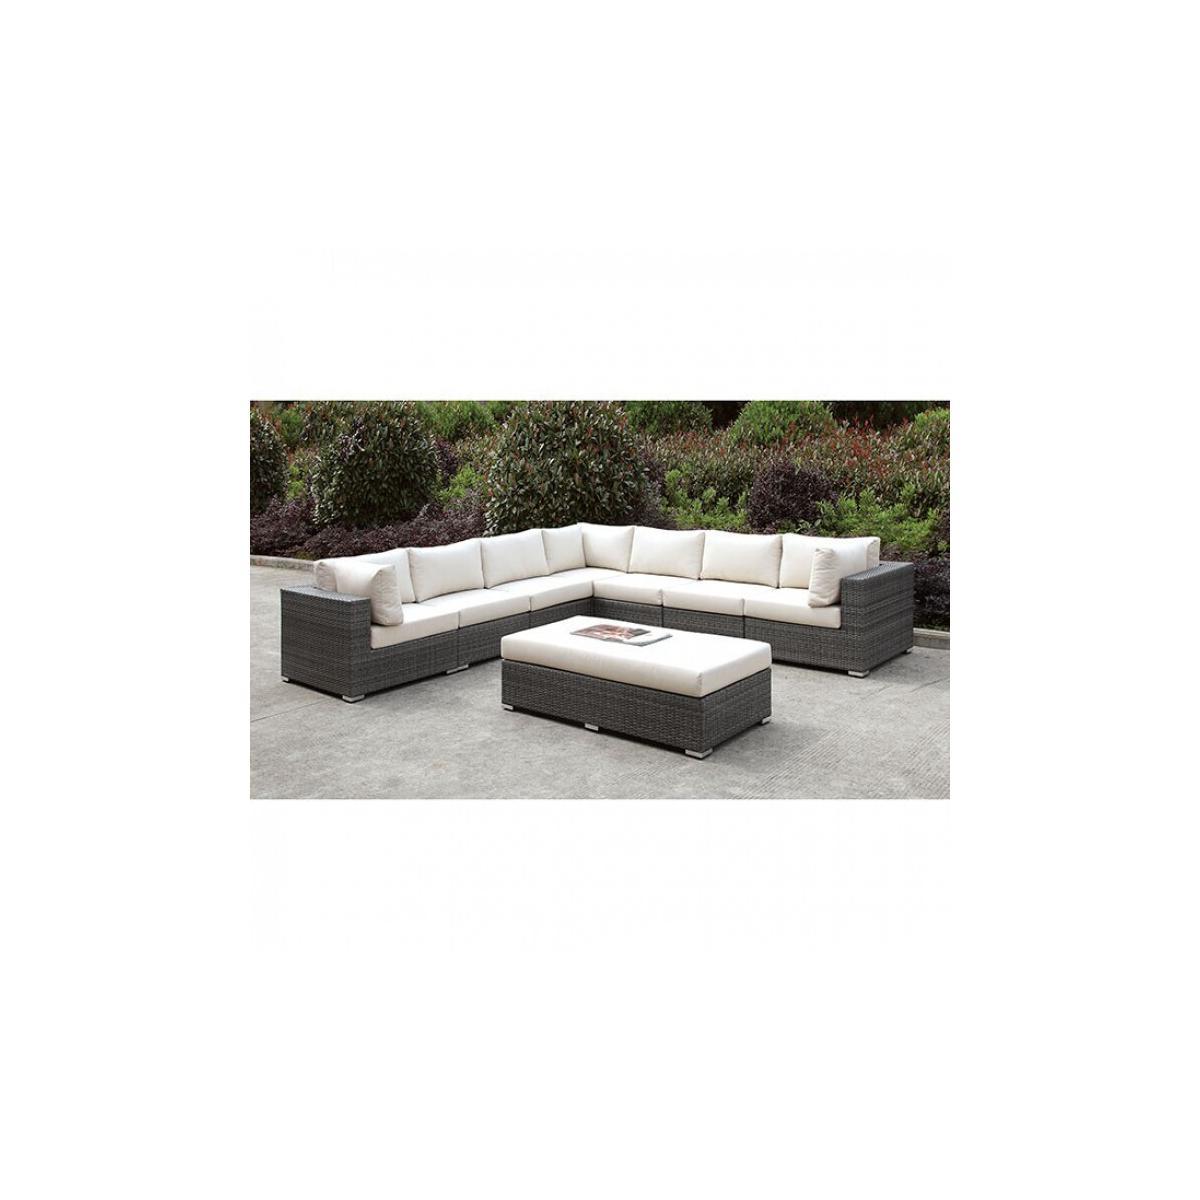 See Details - Somani Large L-sectional + Bench